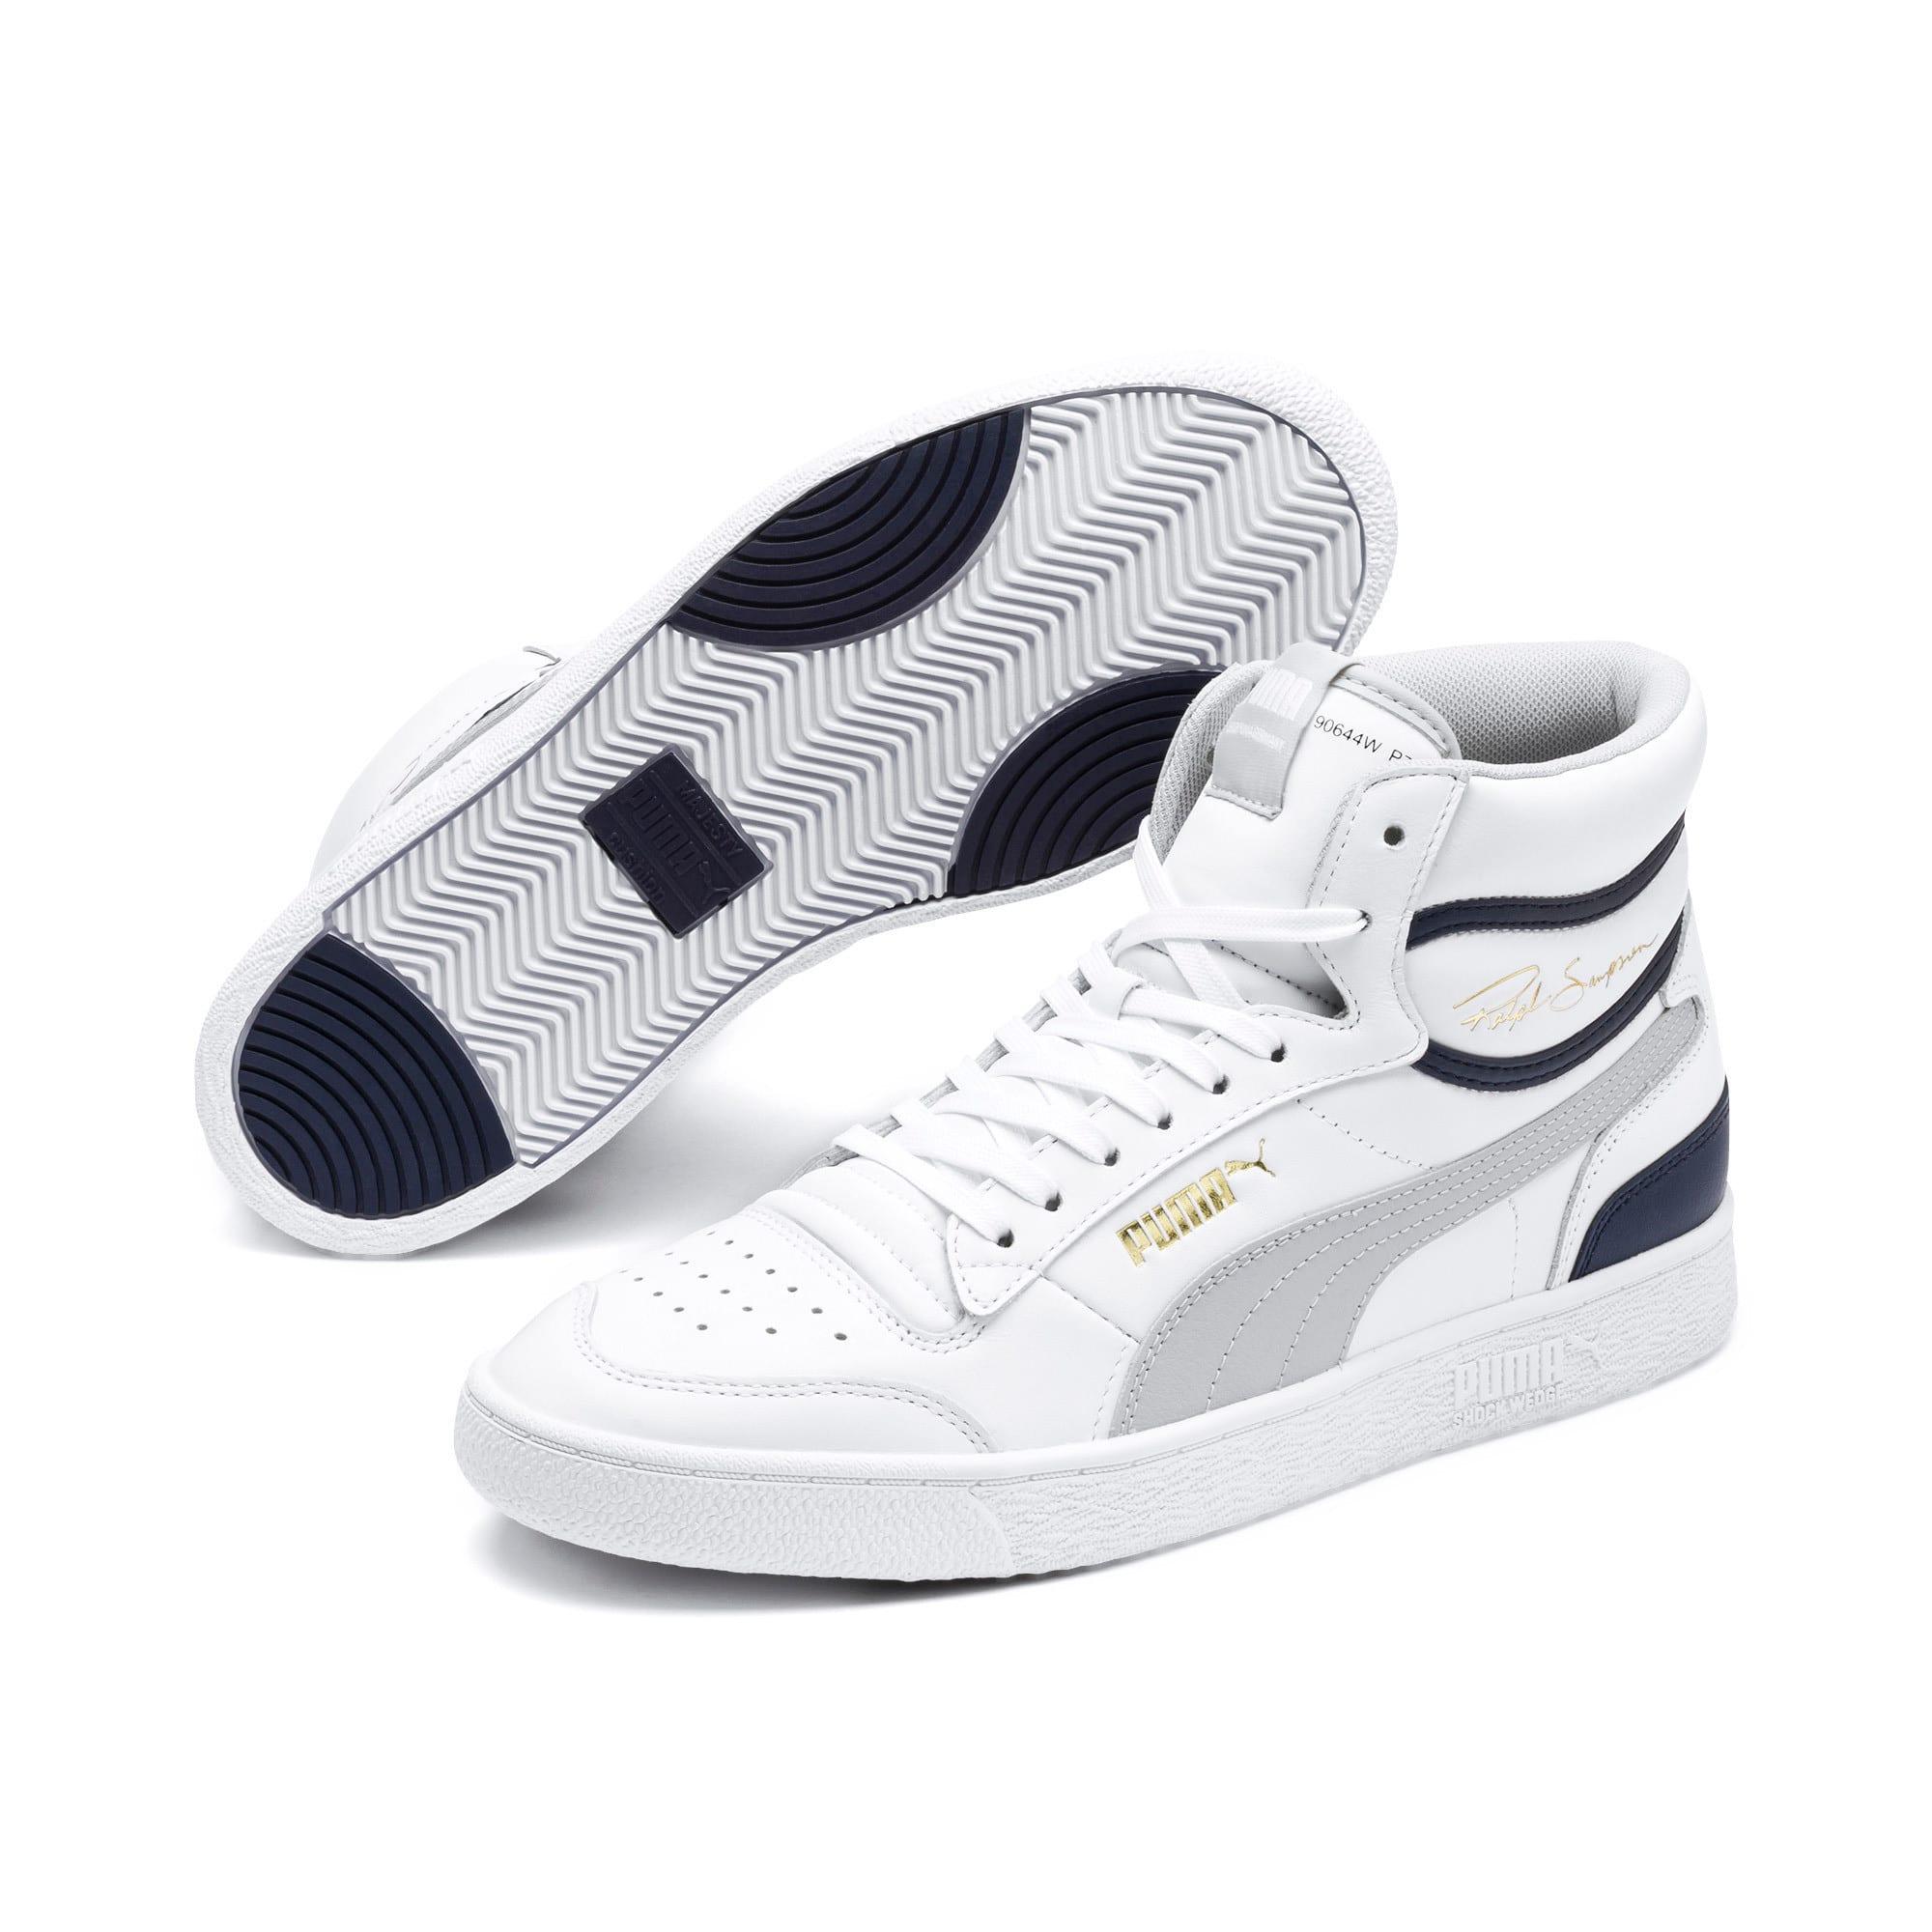 Thumbnail 2 of Ralph Sampson Mid Sneakers, P White-Gray Violet-Peacoat, medium